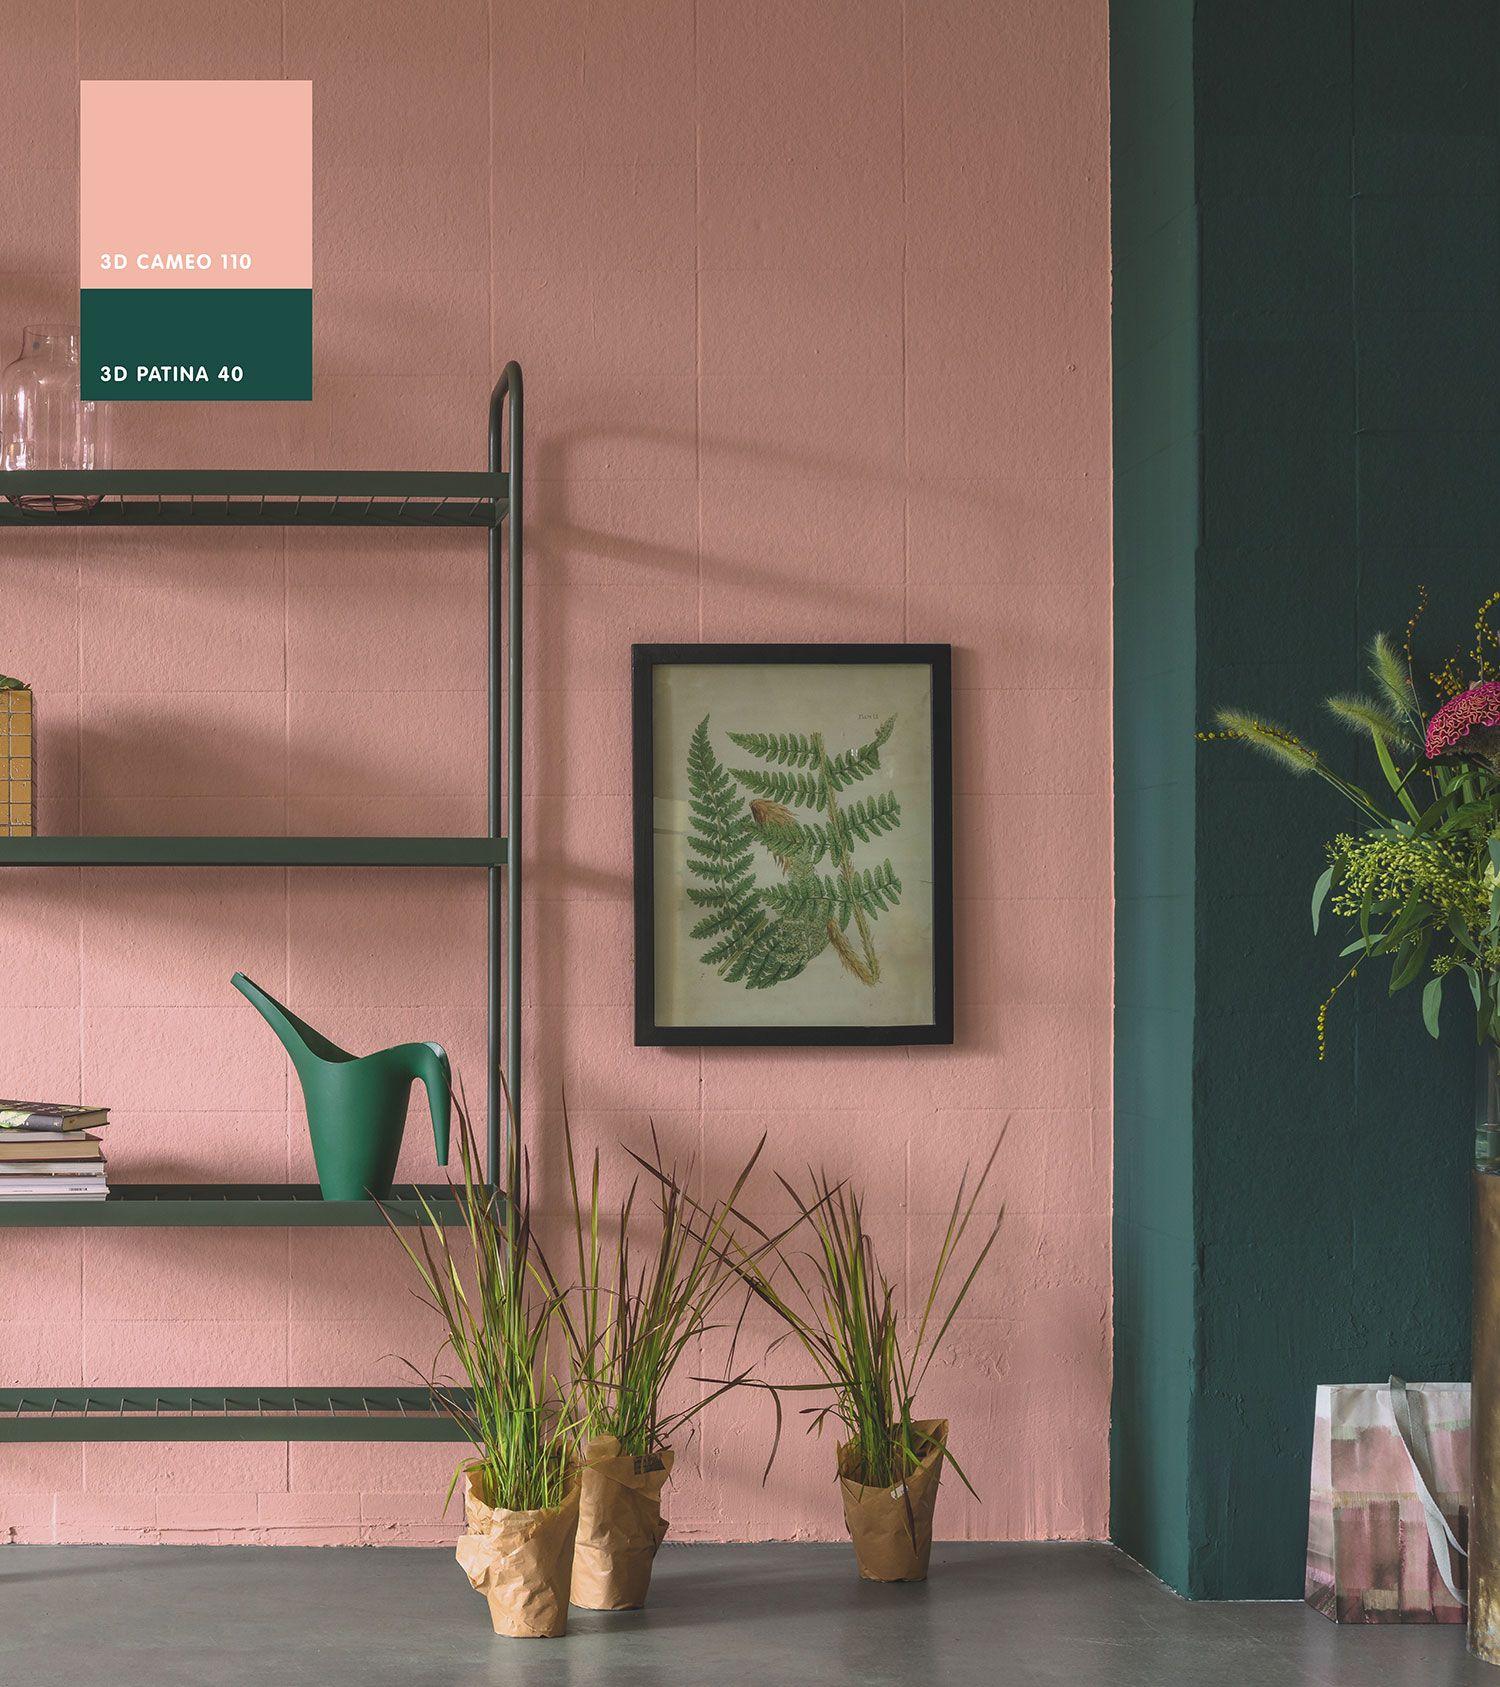 Farbwelt 1 Caparol Haus Deko Wandfarbe Raumgestaltung